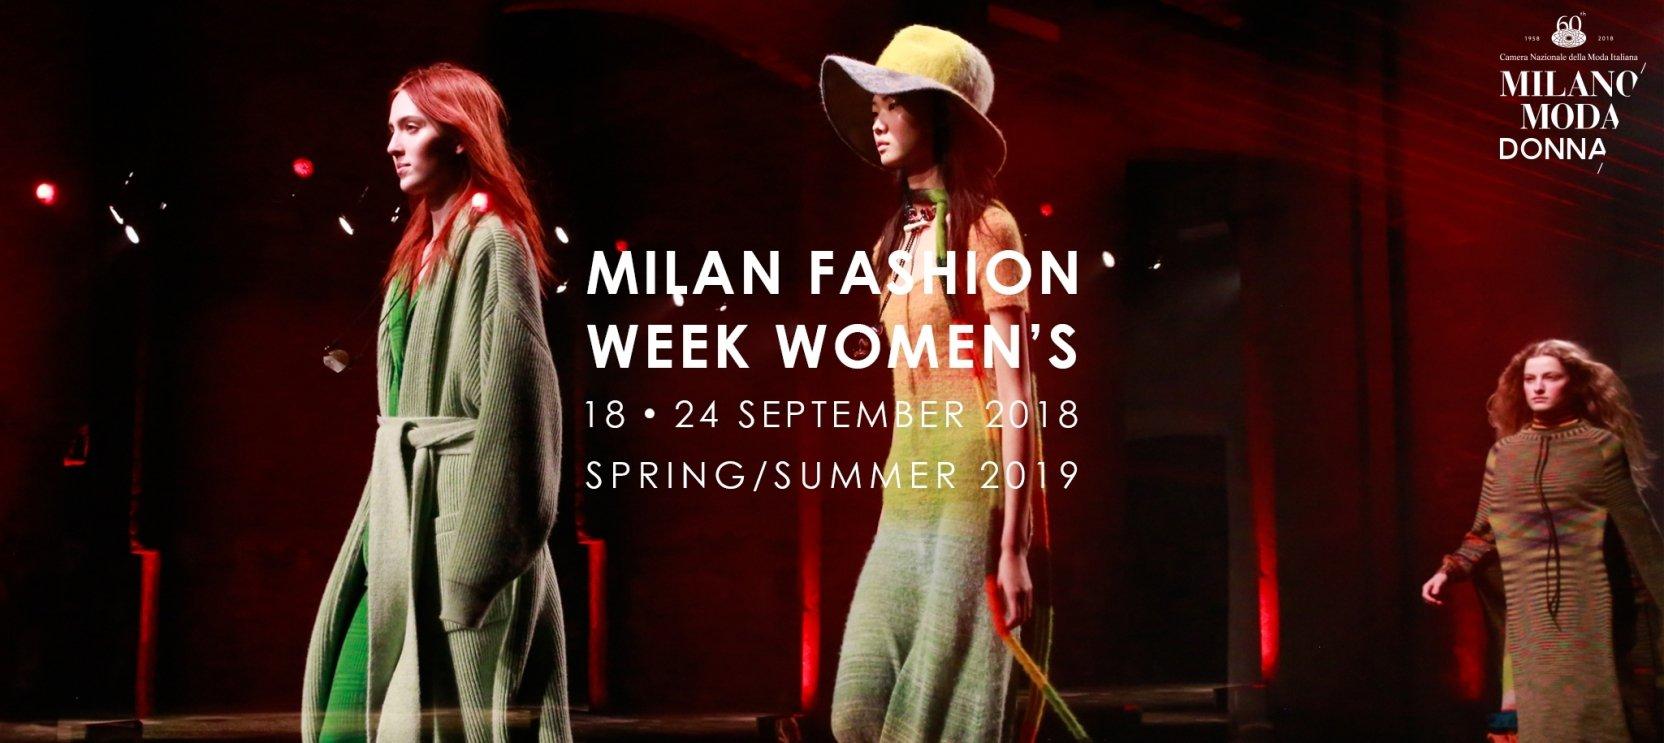 fashionweek2018